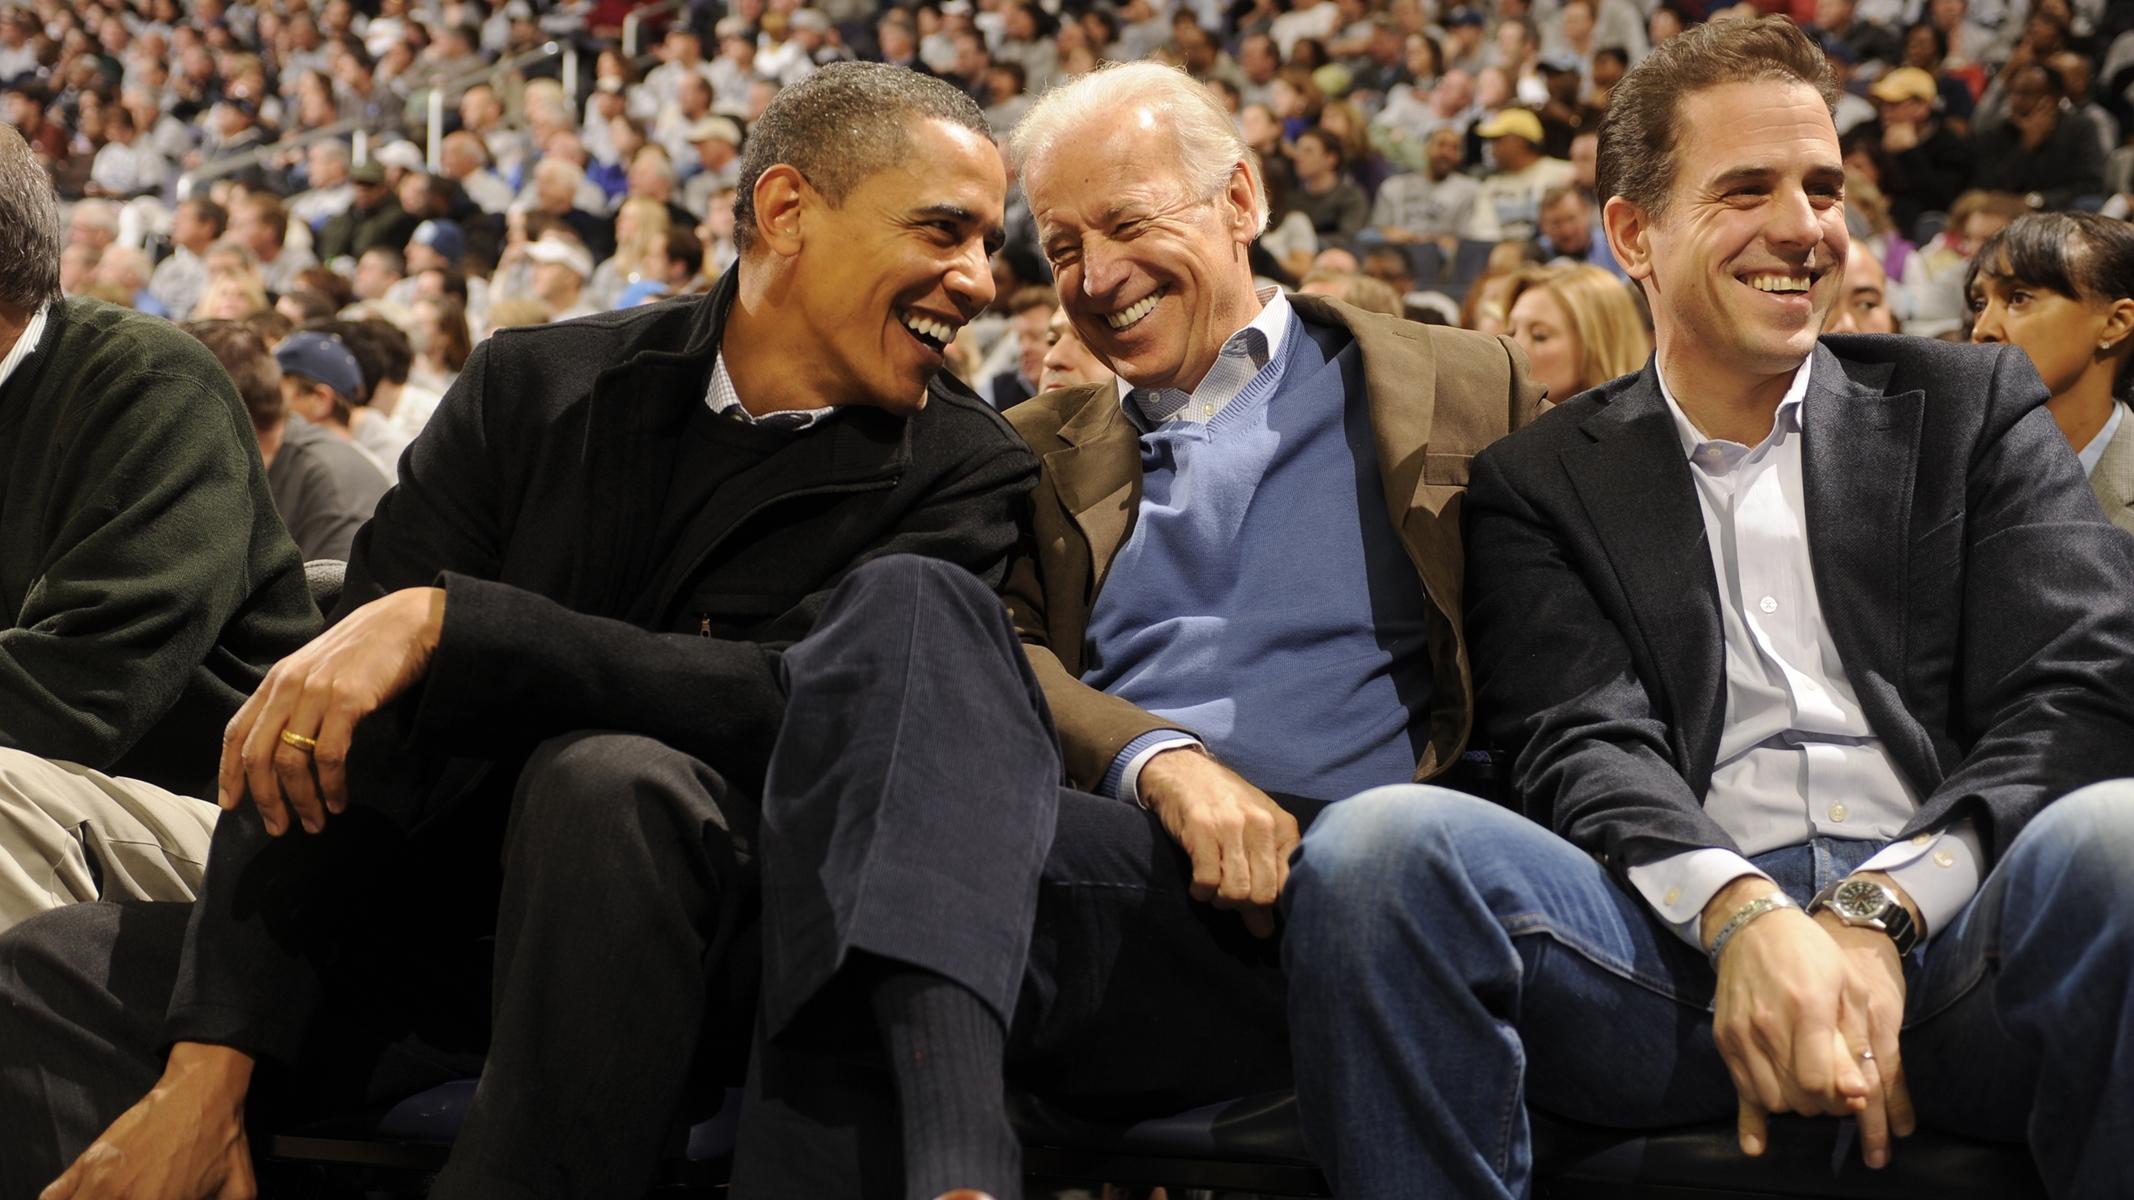 Making Sense of this Ukrainian Mess With Joe Biden, His Son, the <i>NYT</i> and Rudy Giuliani